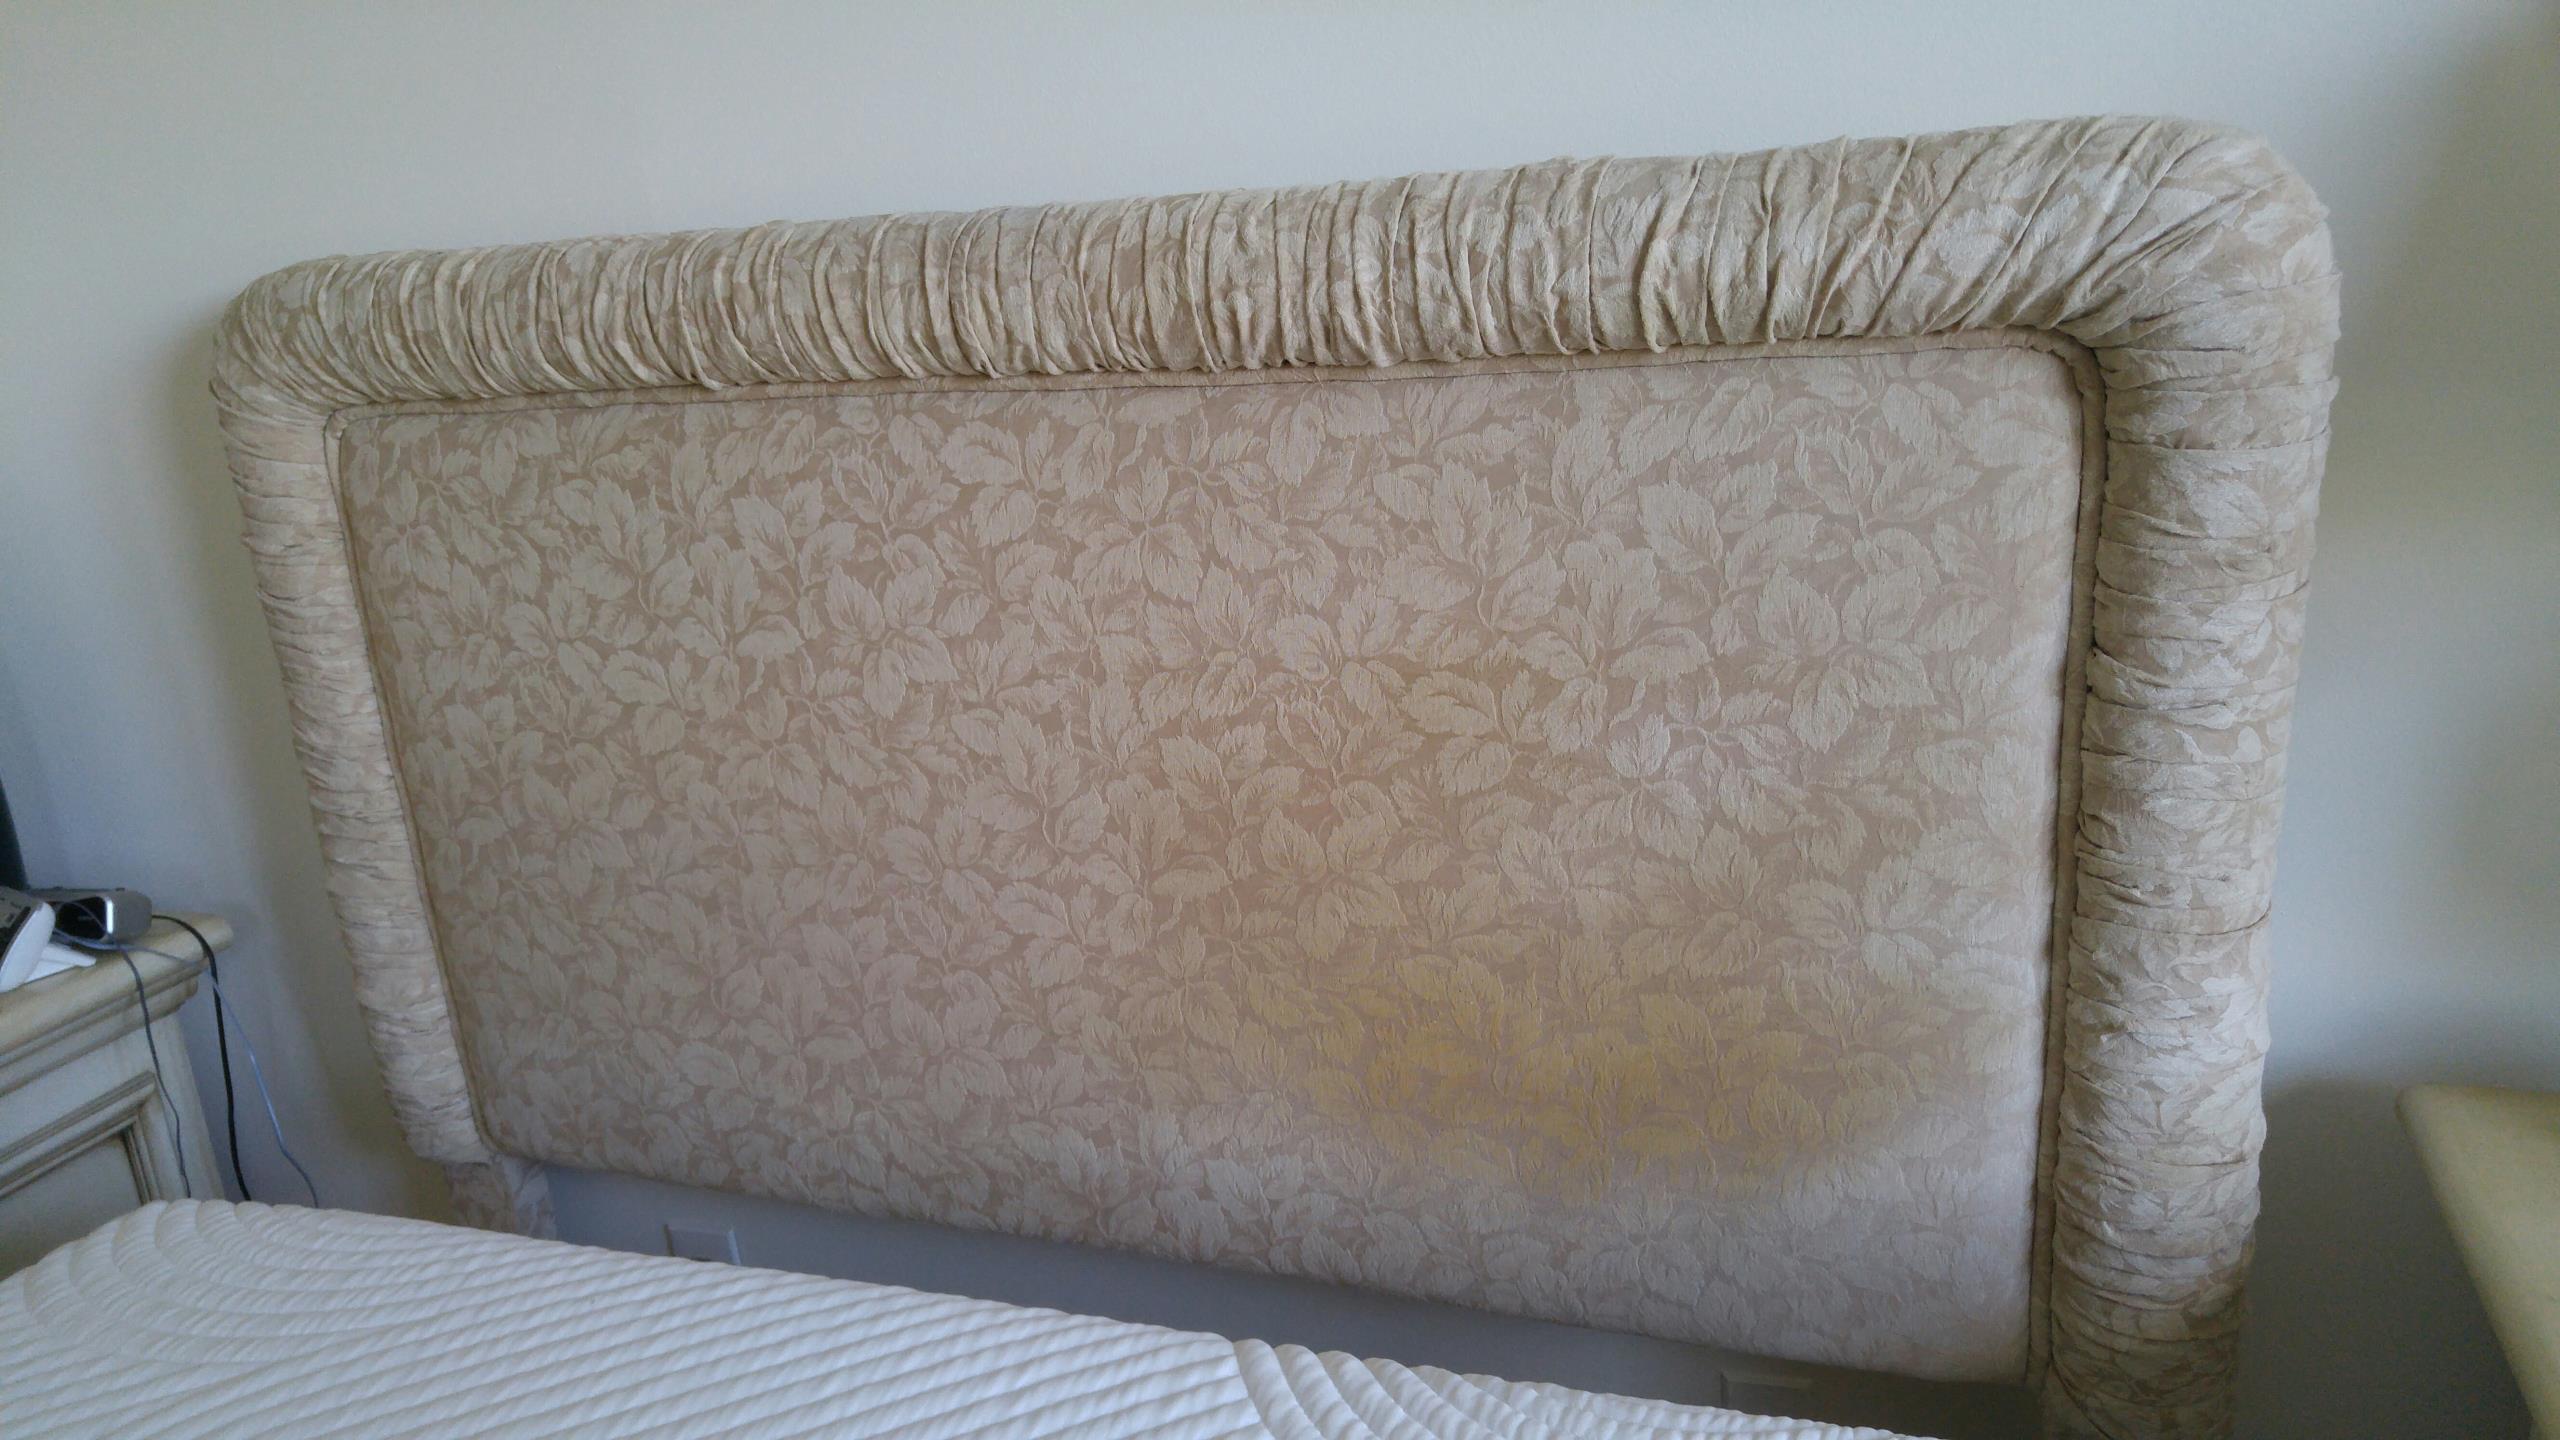 Cleaning upholstery headboard in Boynton Beach